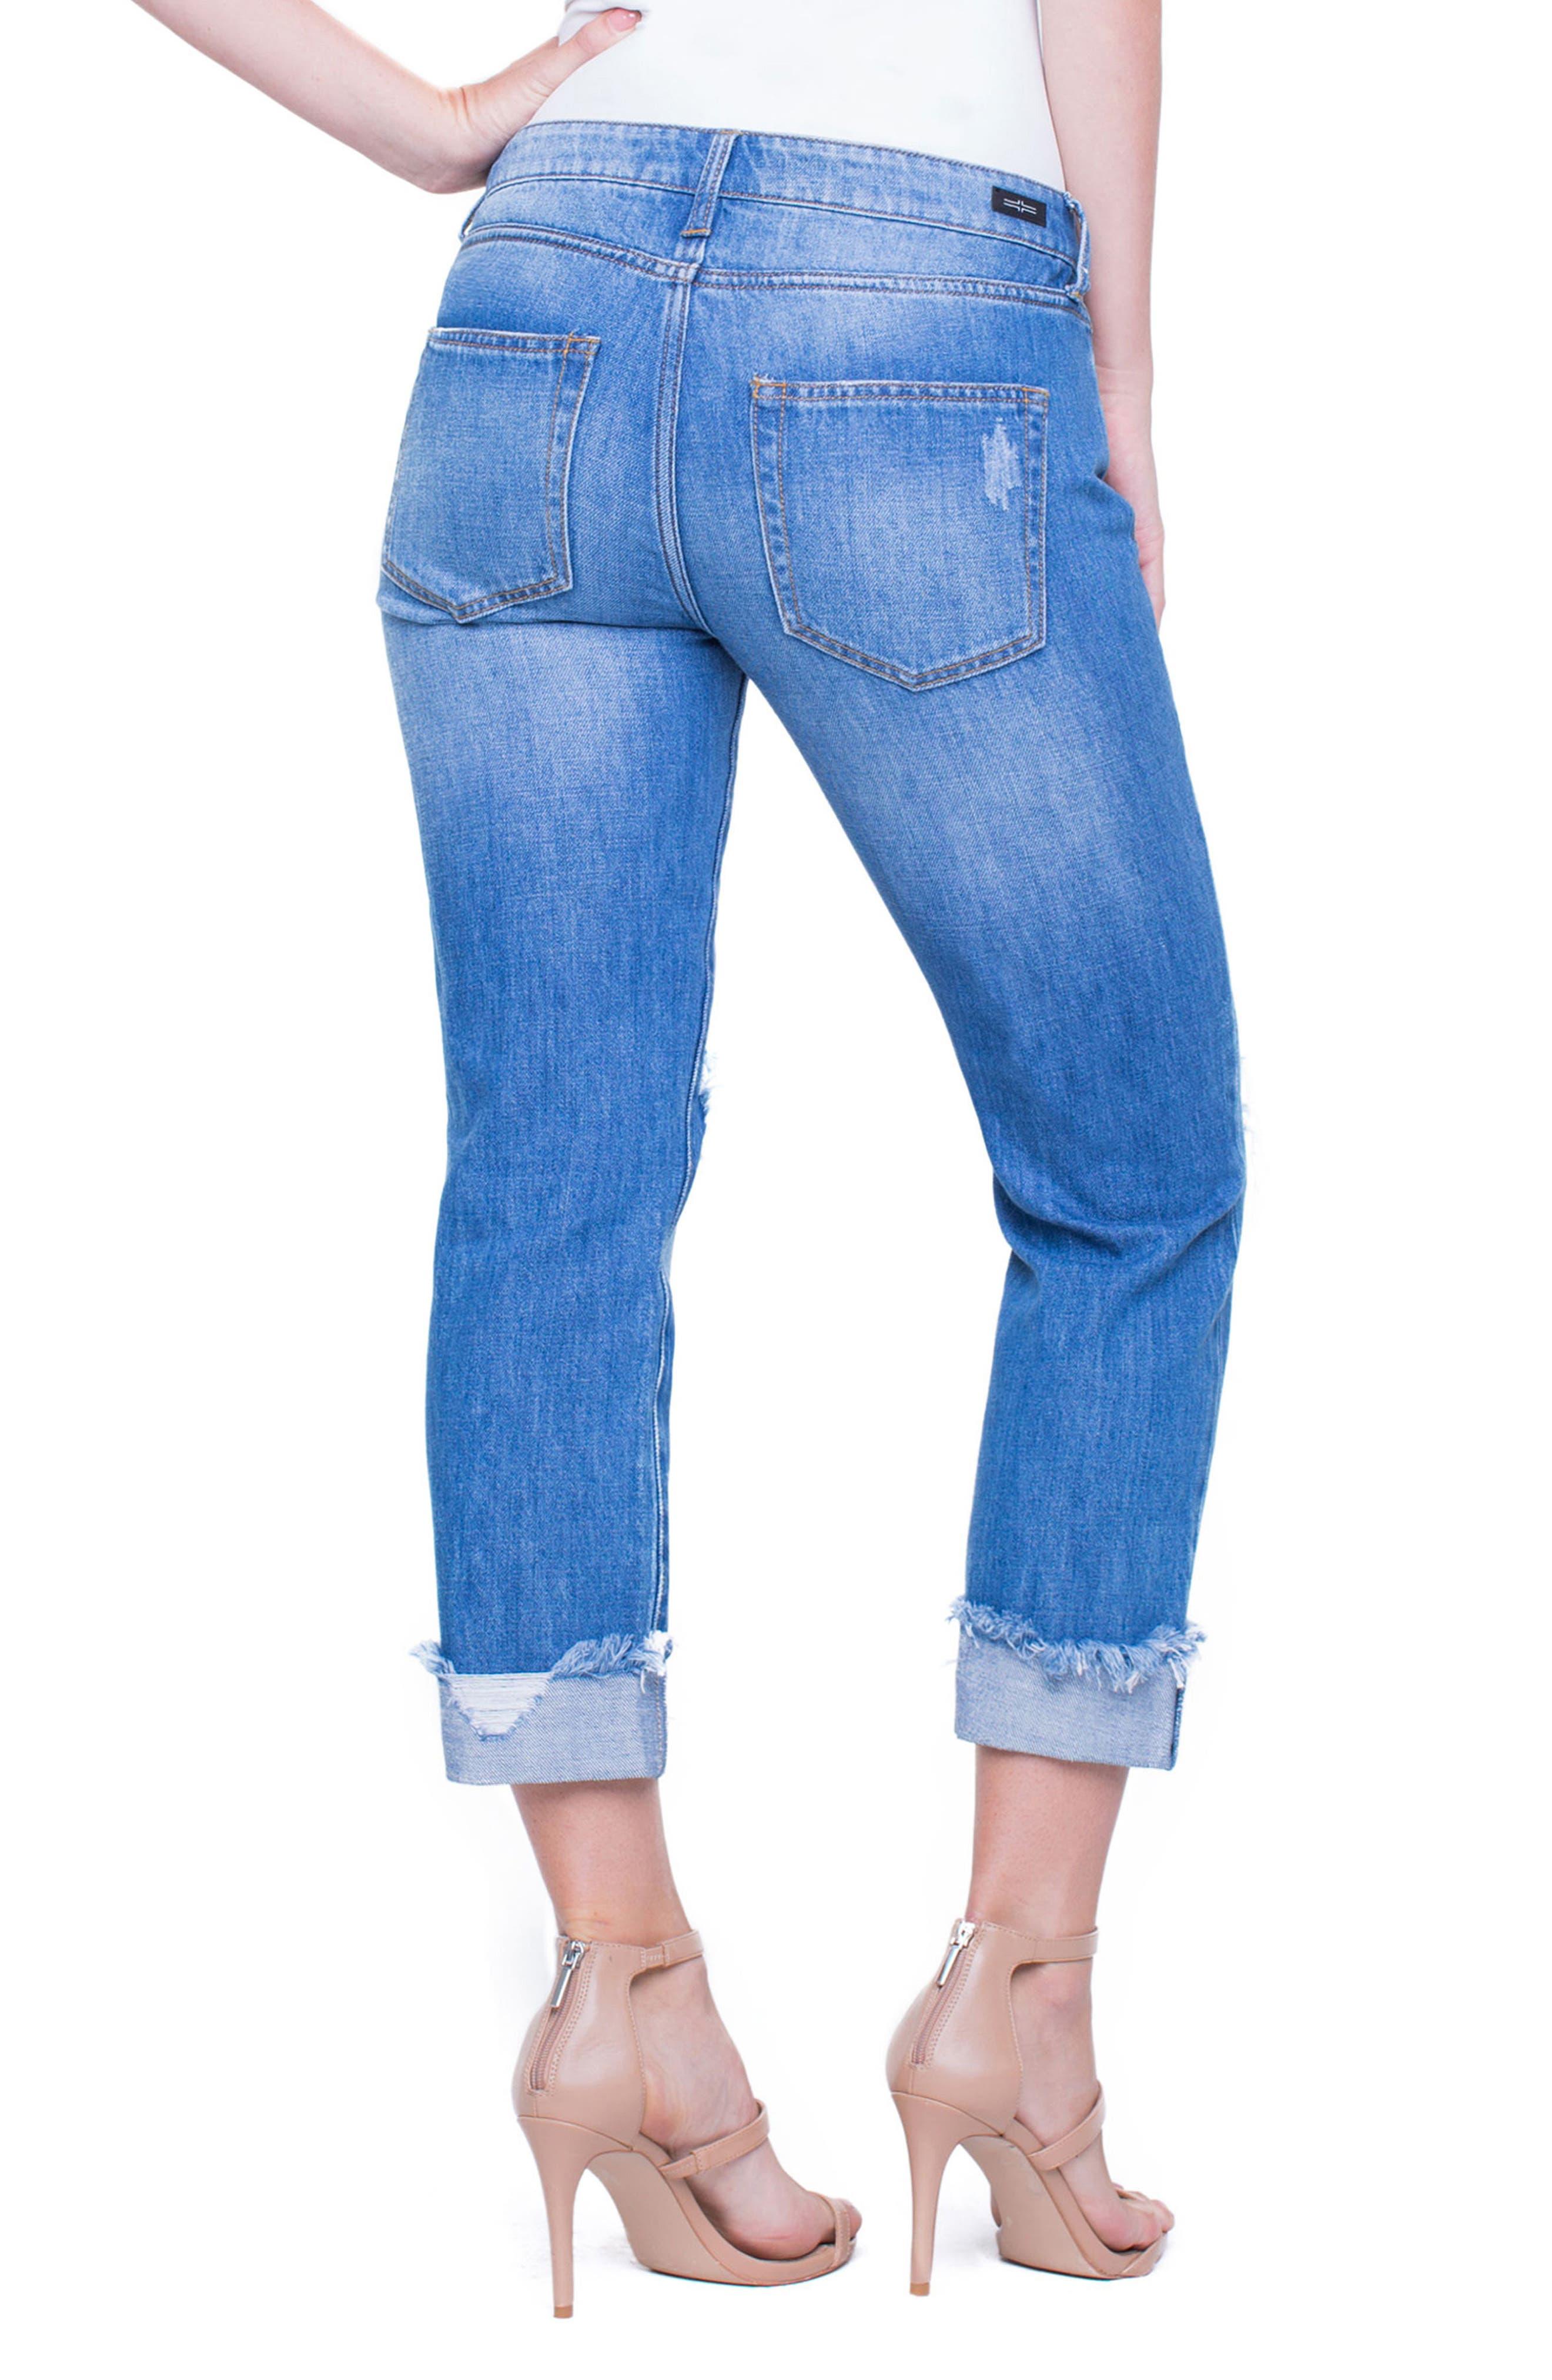 Jeans Company Kennedy Distressed Raw Hem Crop Boyfriend Jeans,                             Alternate thumbnail 2, color,                             402